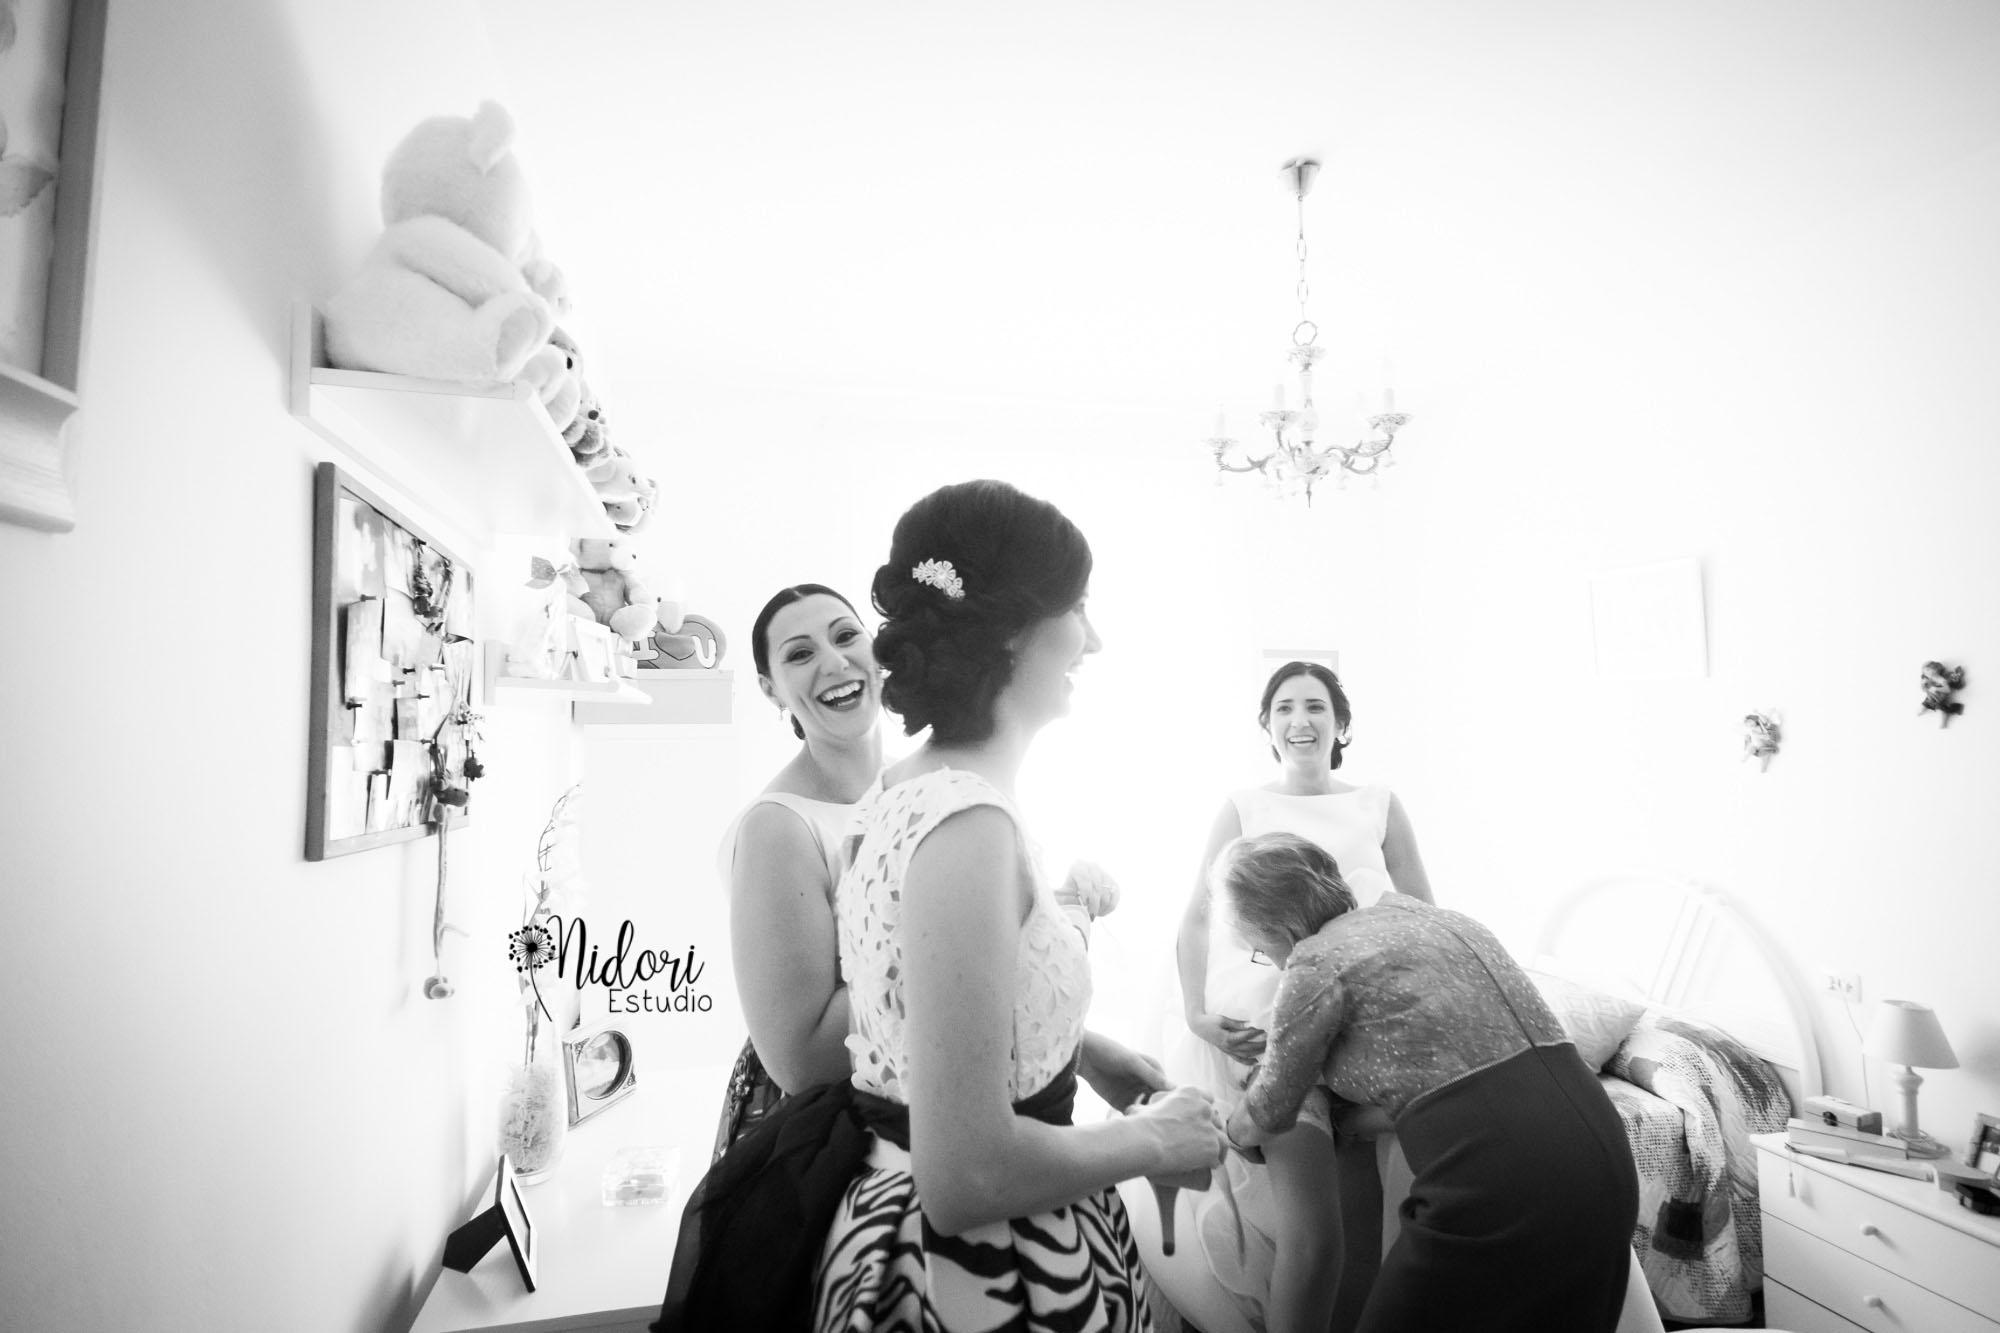 fotos-de-boda-reportaje-novios-fotografia-boda-nidoriestudio-fotos-valencia-almazora-castellon-españa-spain-007